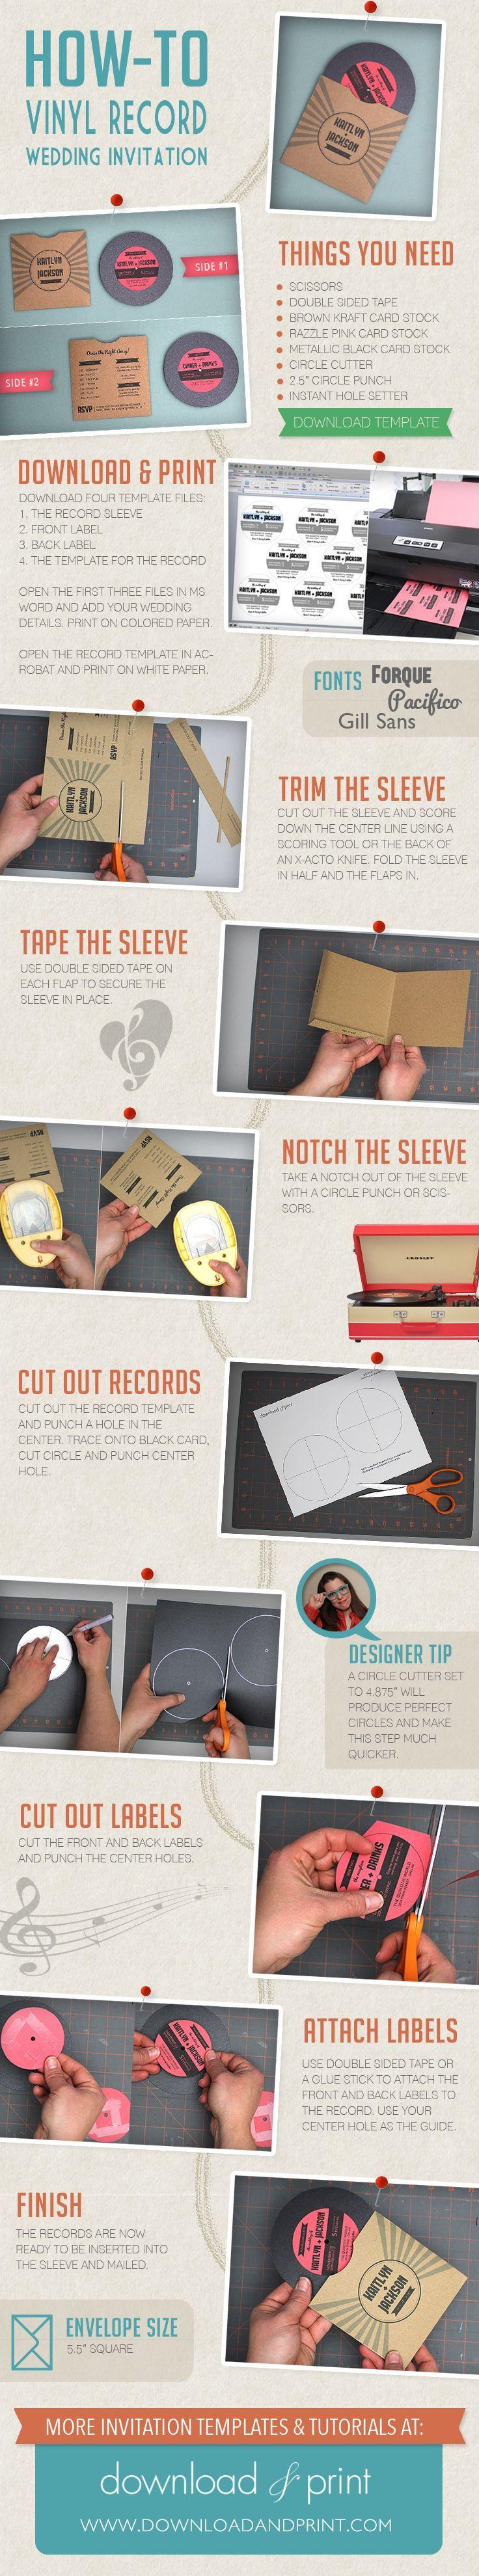 diy cd wedding invitations%0A HowTo DIY a vinyl record wedding invitation from  Downloadandprint